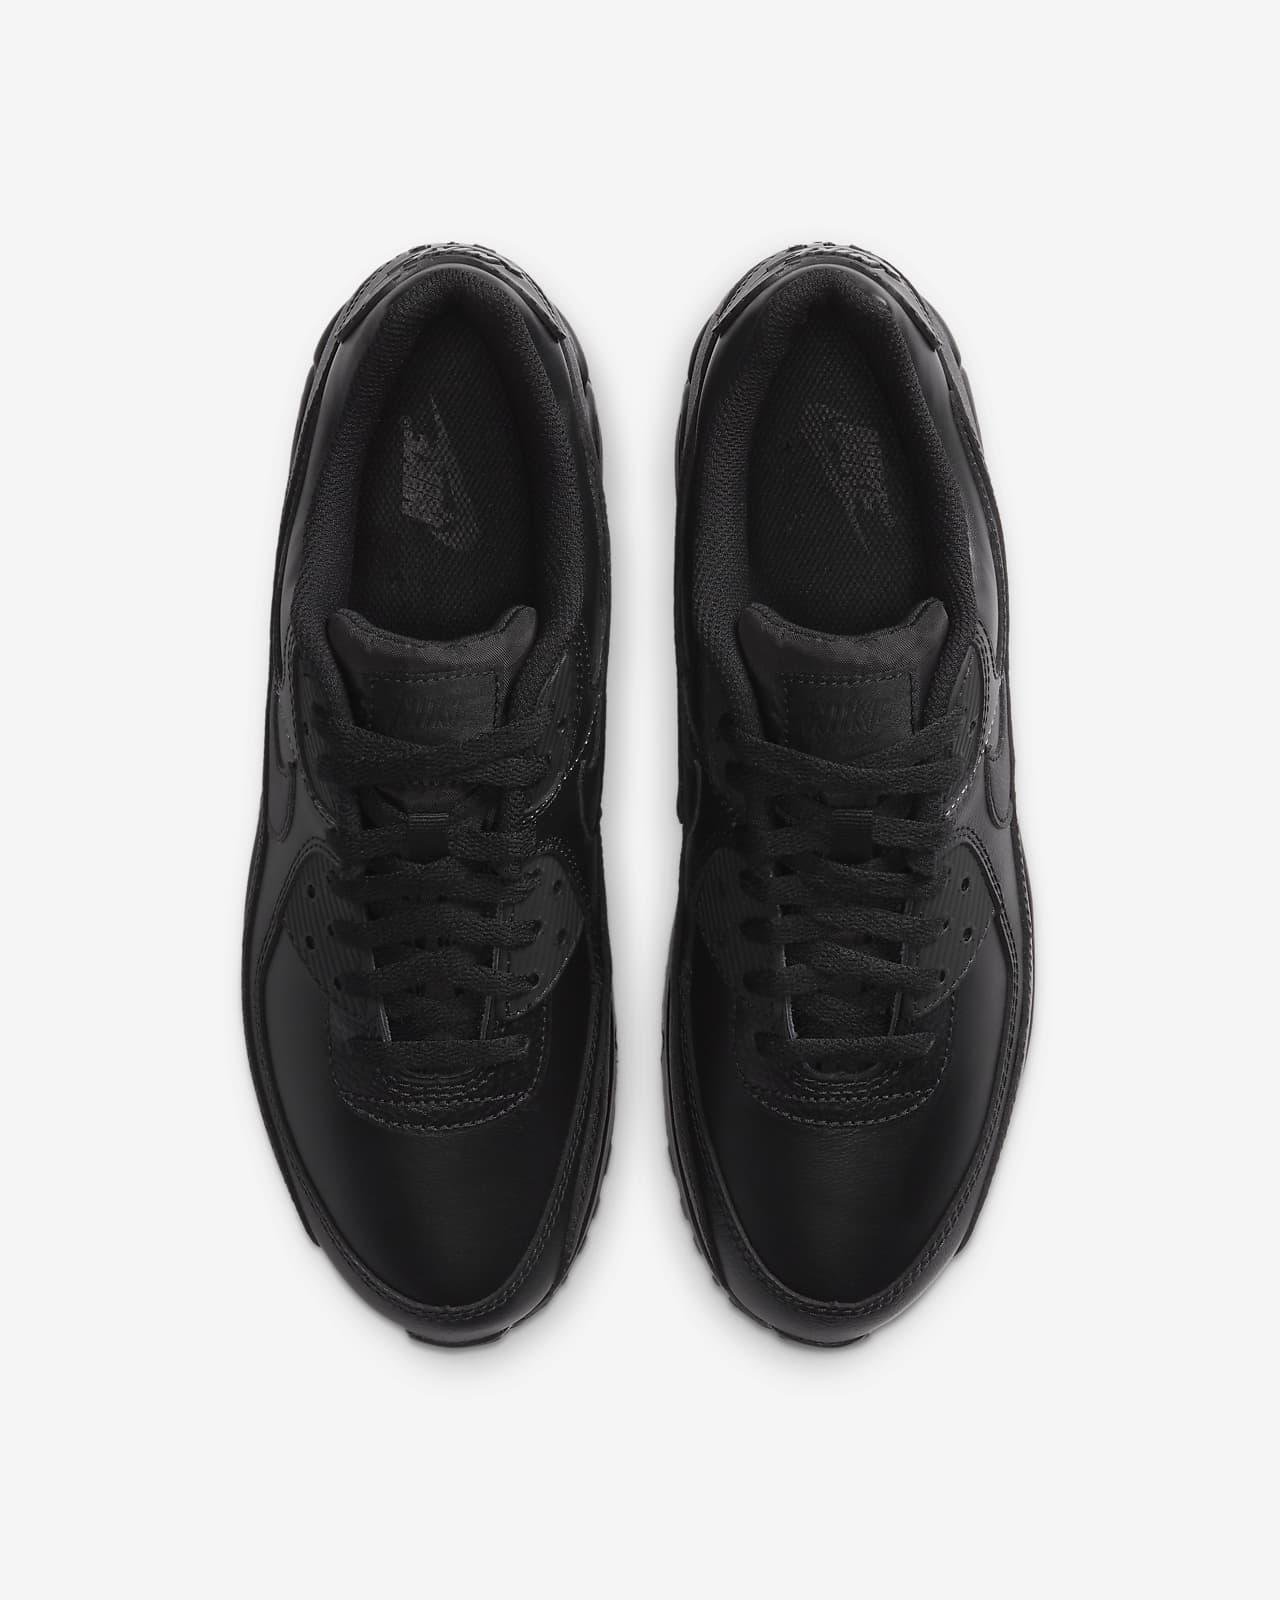 air max 90 leather uomo nere